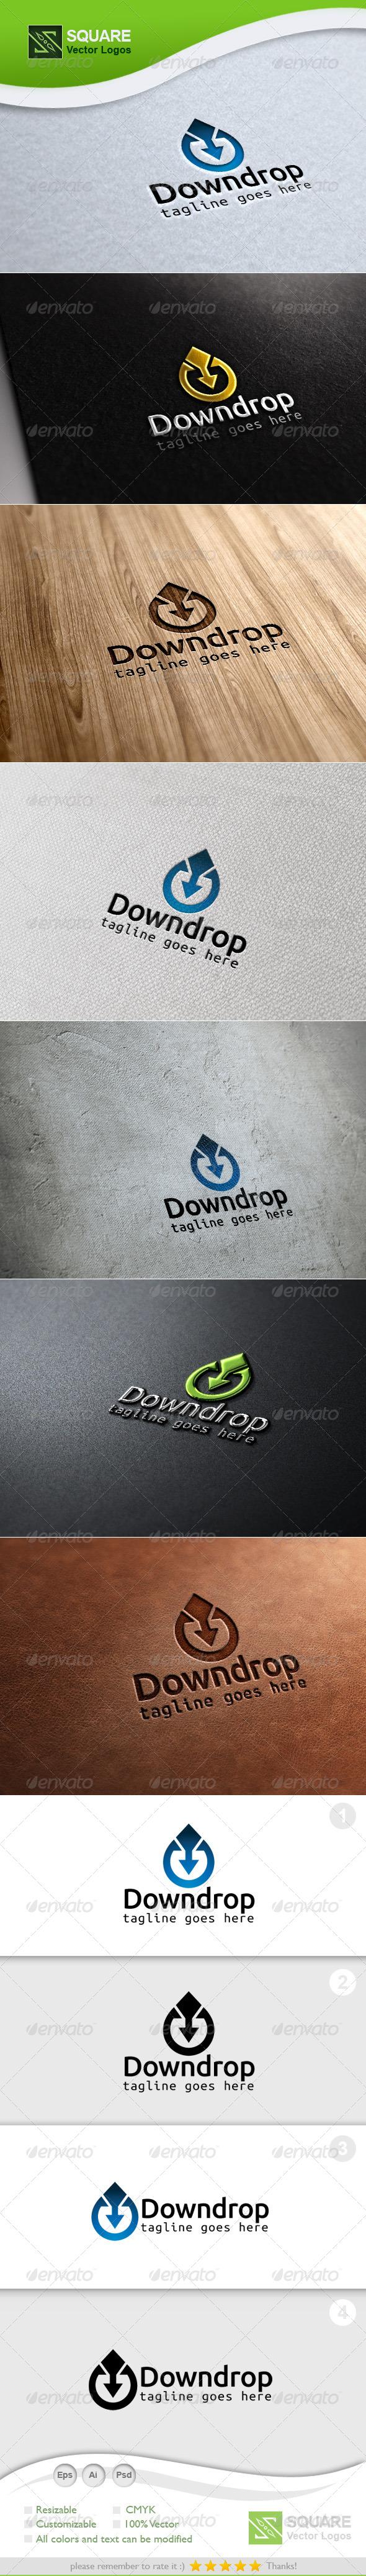 Drop Down Arrow Vector Logo Template - Nature Logo Templates